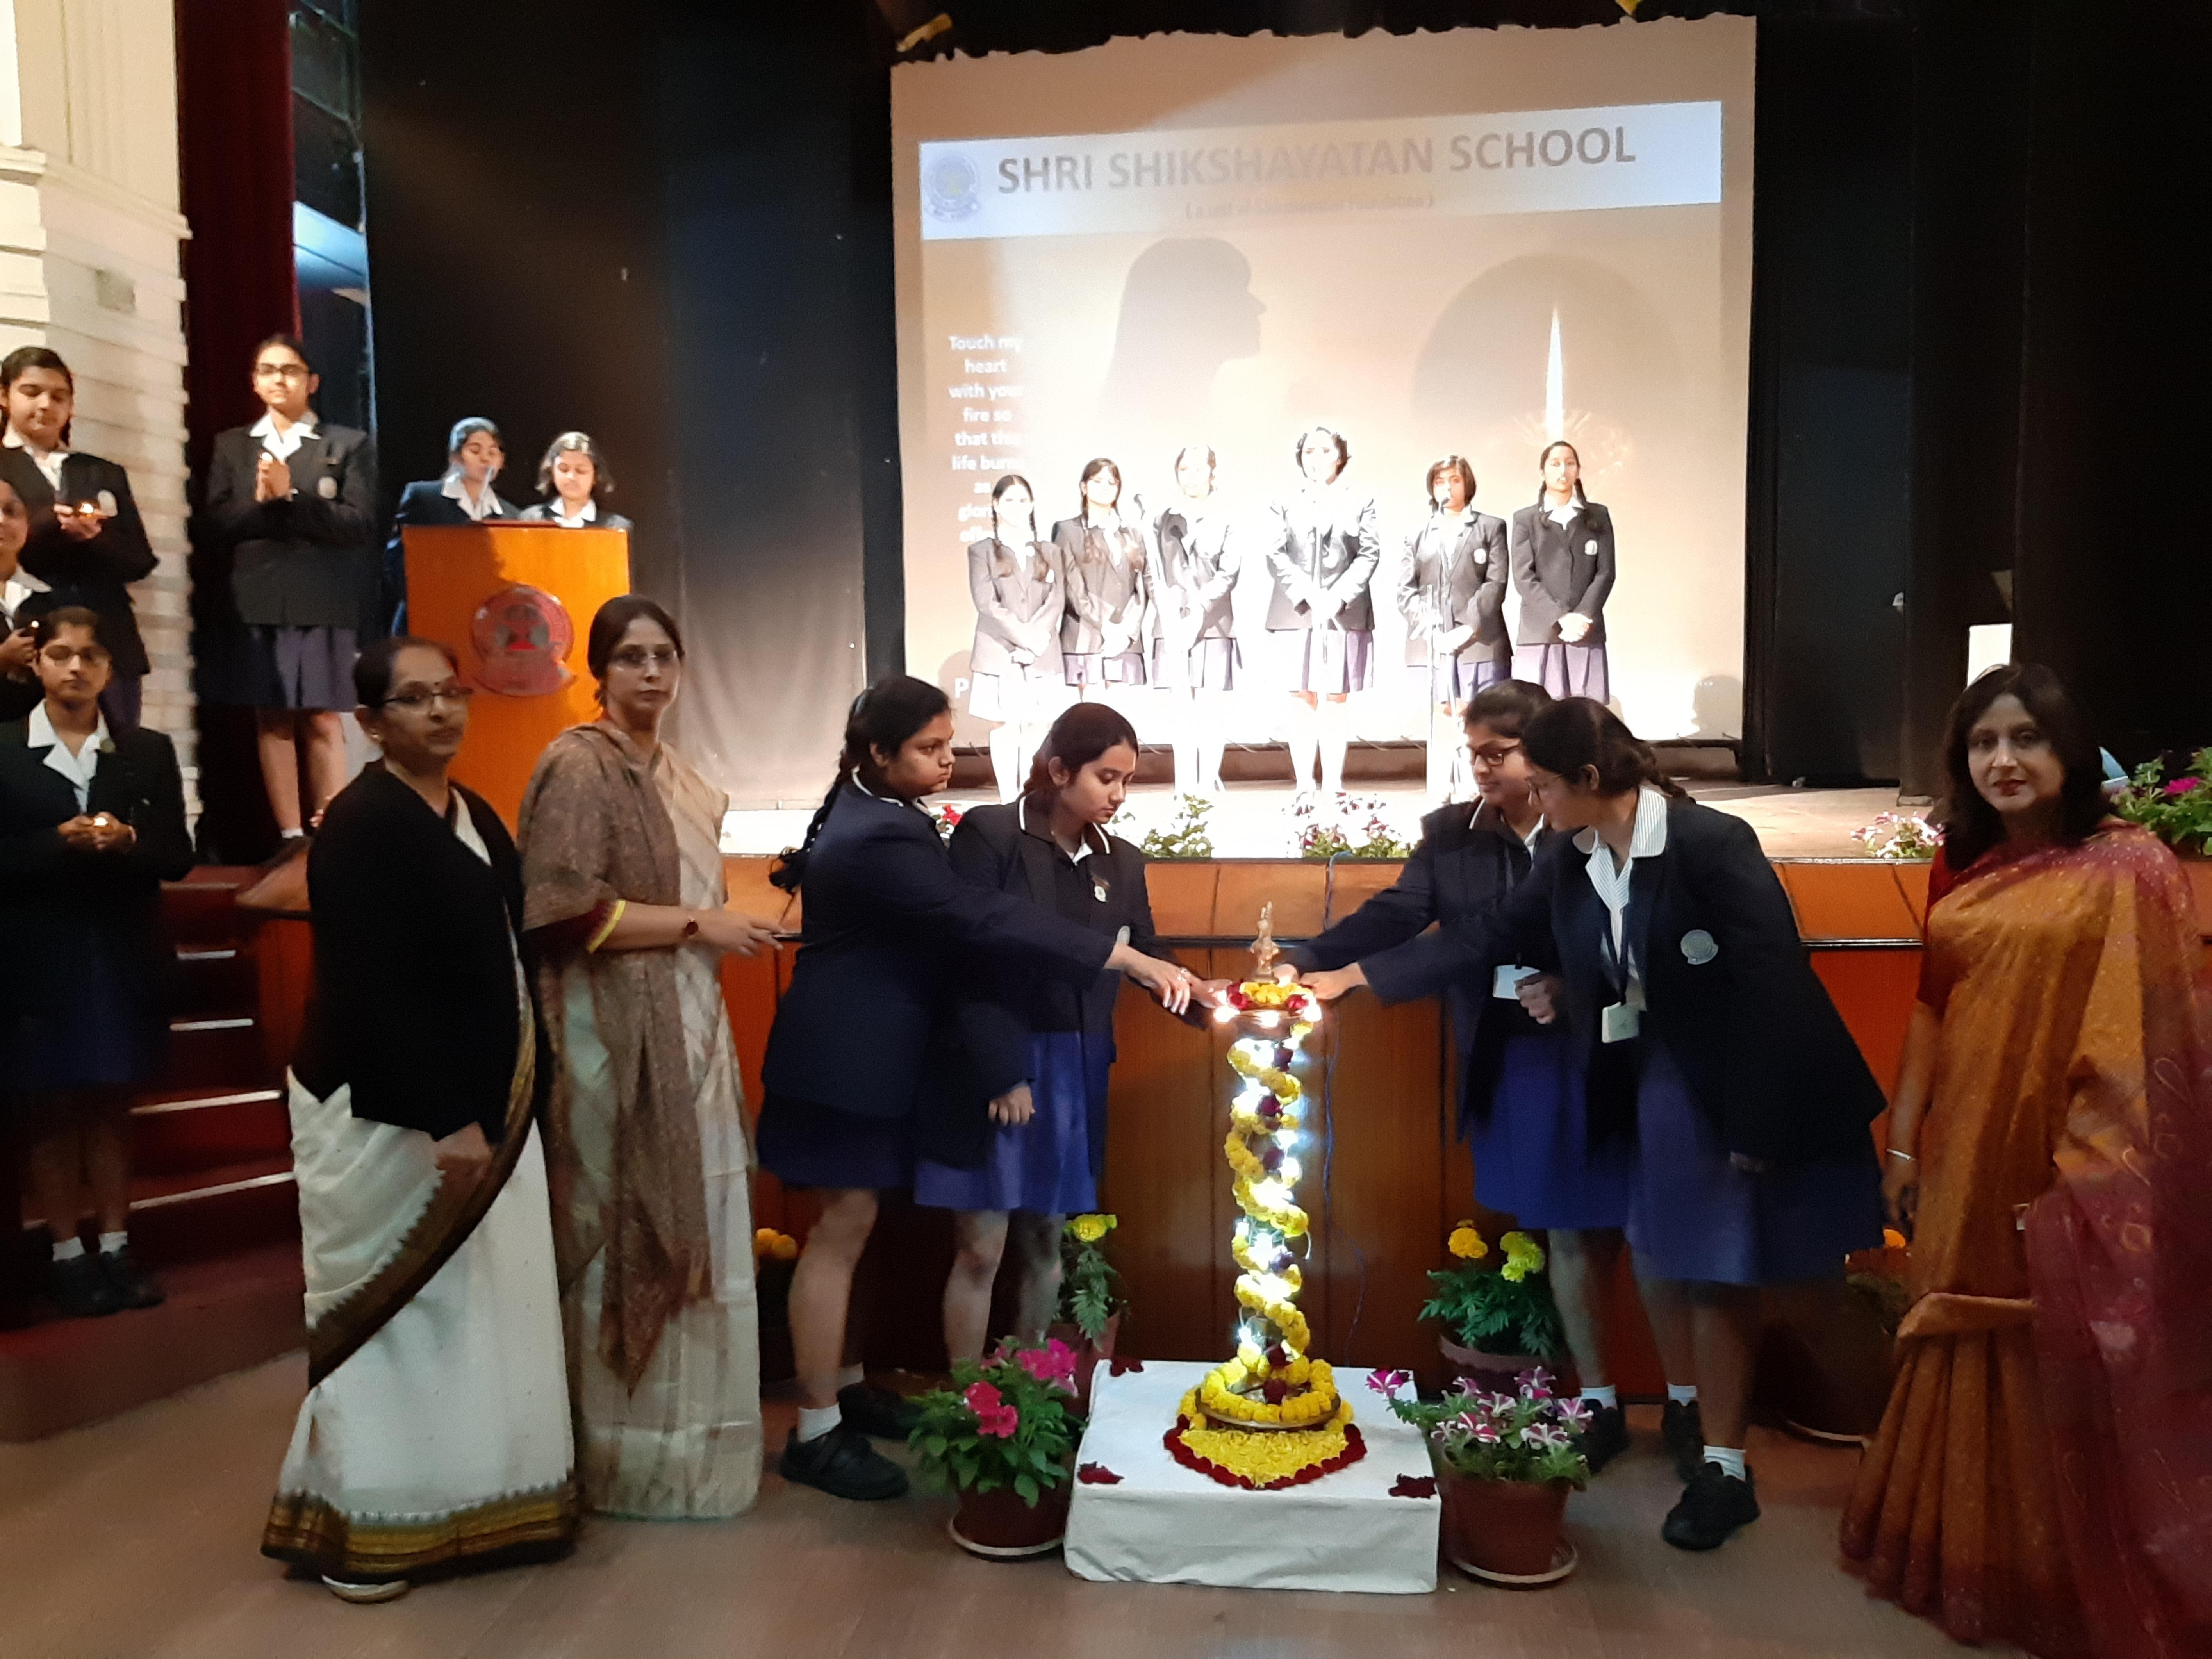 Shri Shikshayatan holds prayer service for classes X & XII